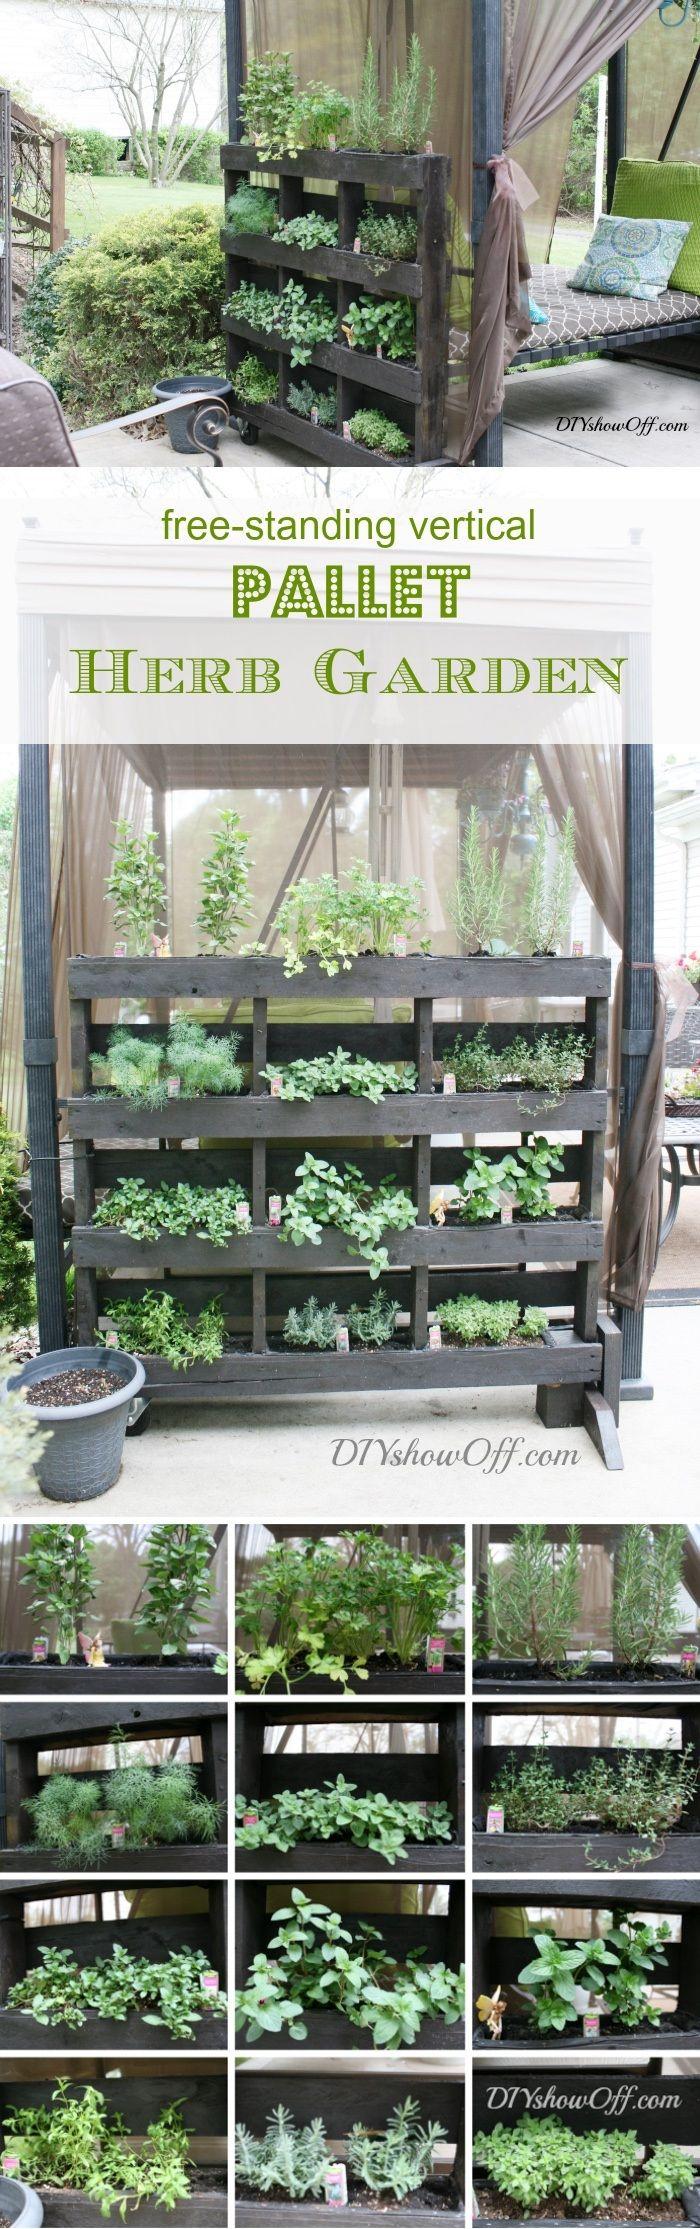 Free Standing Pallet Herb Garden | 19 Inspiring DIY Pallet Planter Ideas